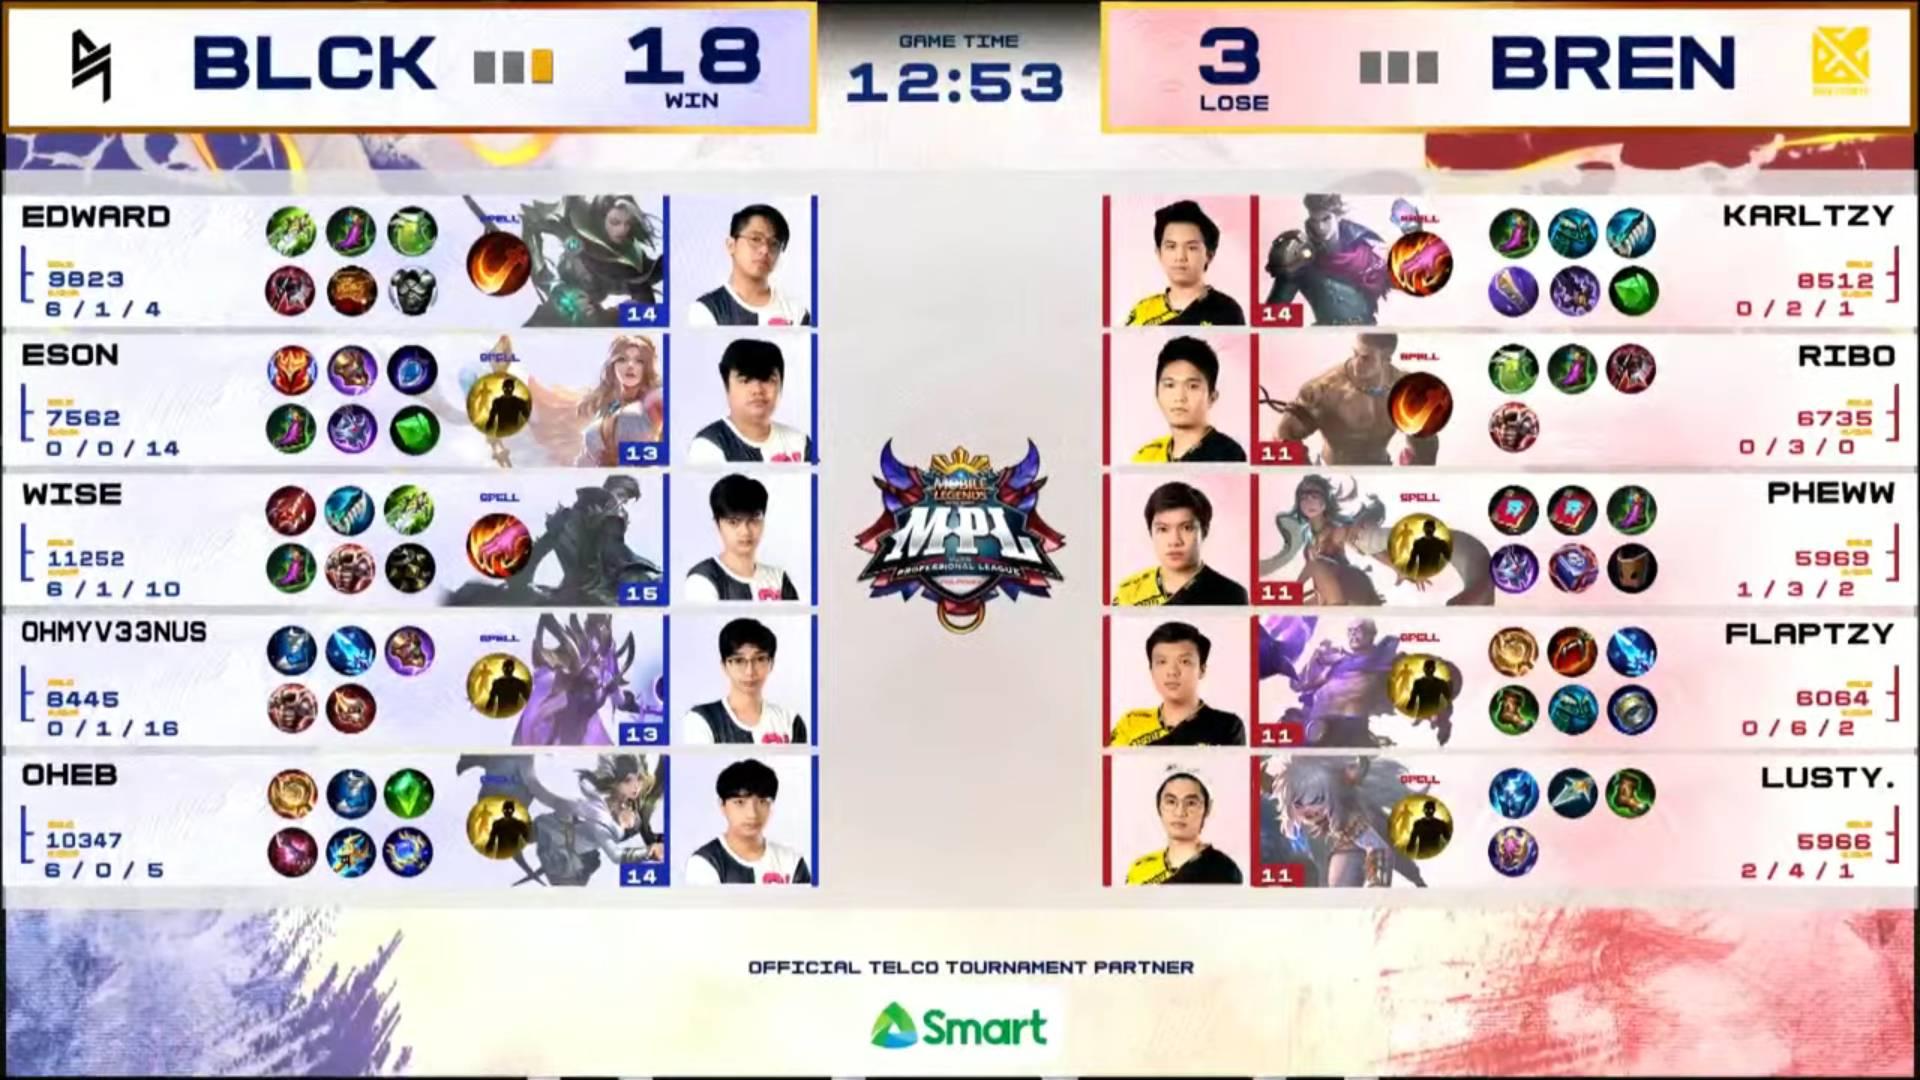 MPL-PH-Season-7-upper-bracket-Blacklist-def-Bren-Game-1 Edward, Blacklist survive KarlTzy's storm, sends Bren to MPL lower bracket ESports Mobile Legends MPL-PH News  - philippine sports news